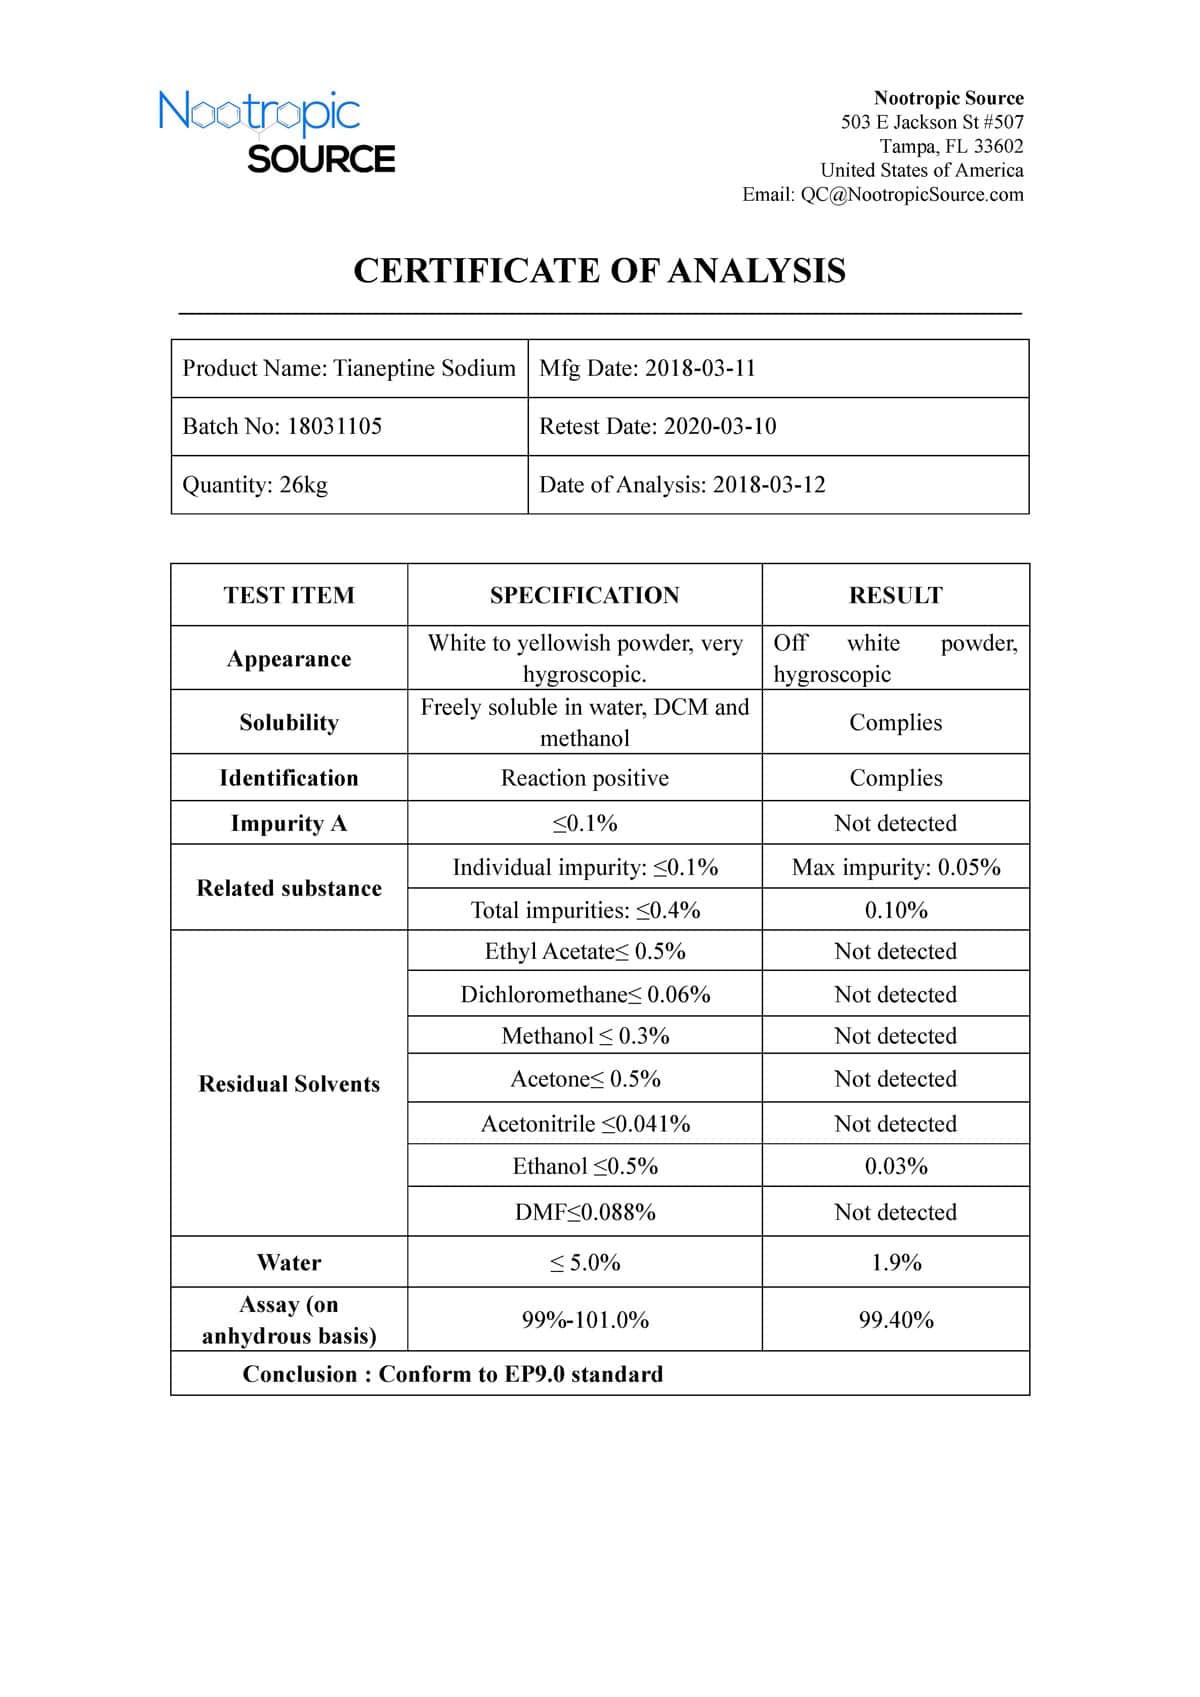 Buy Tianeptine Sodium Powder | Nootropic Source